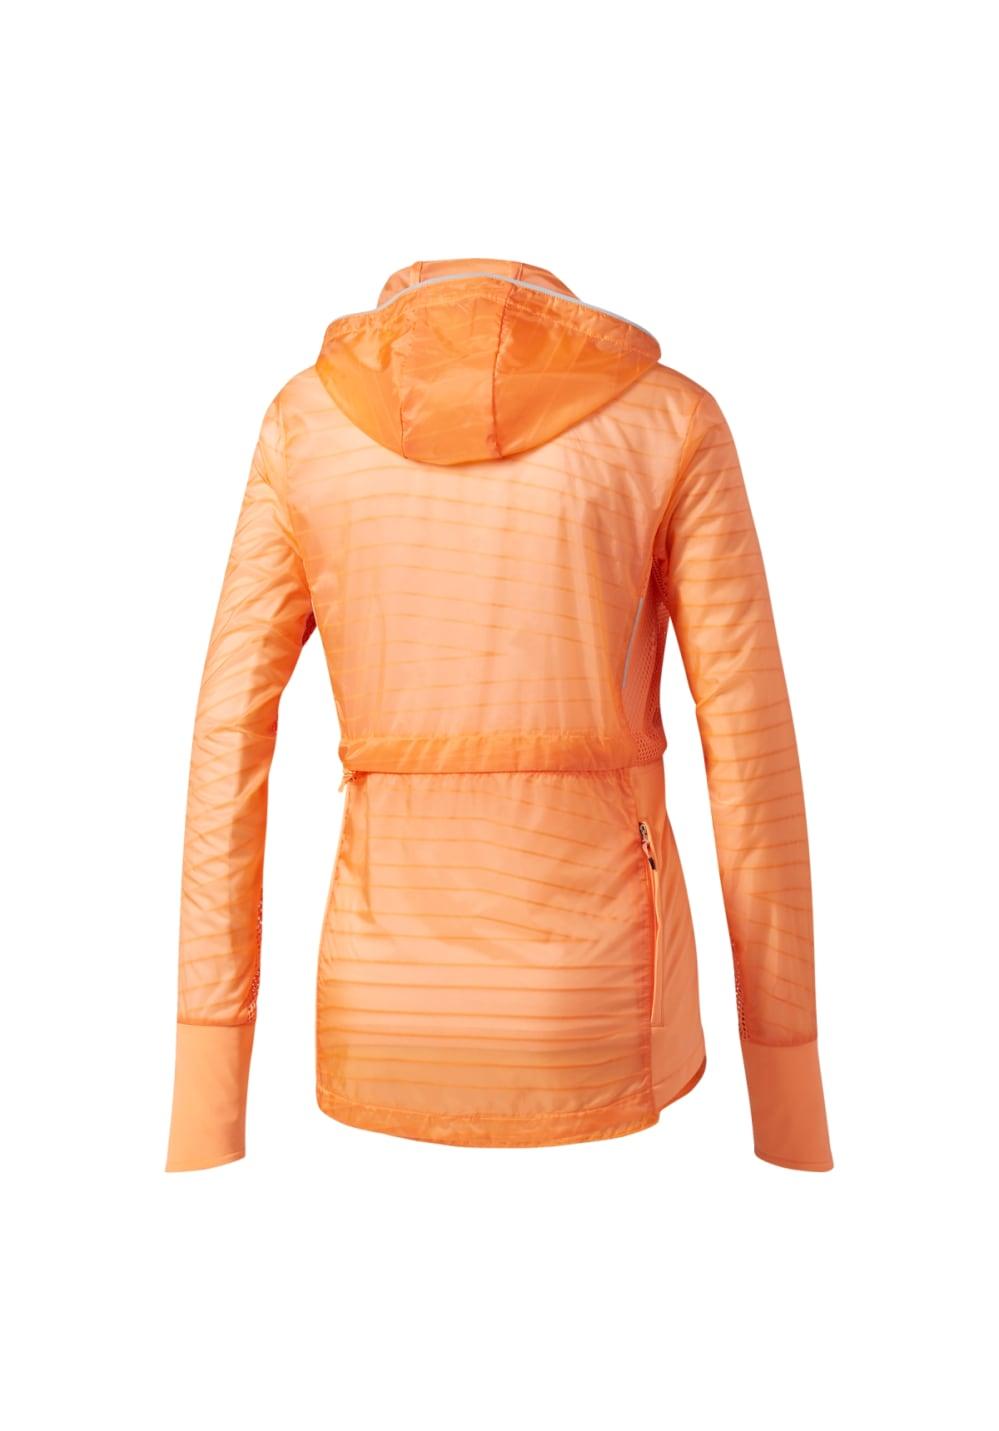 veste adidas orange femme